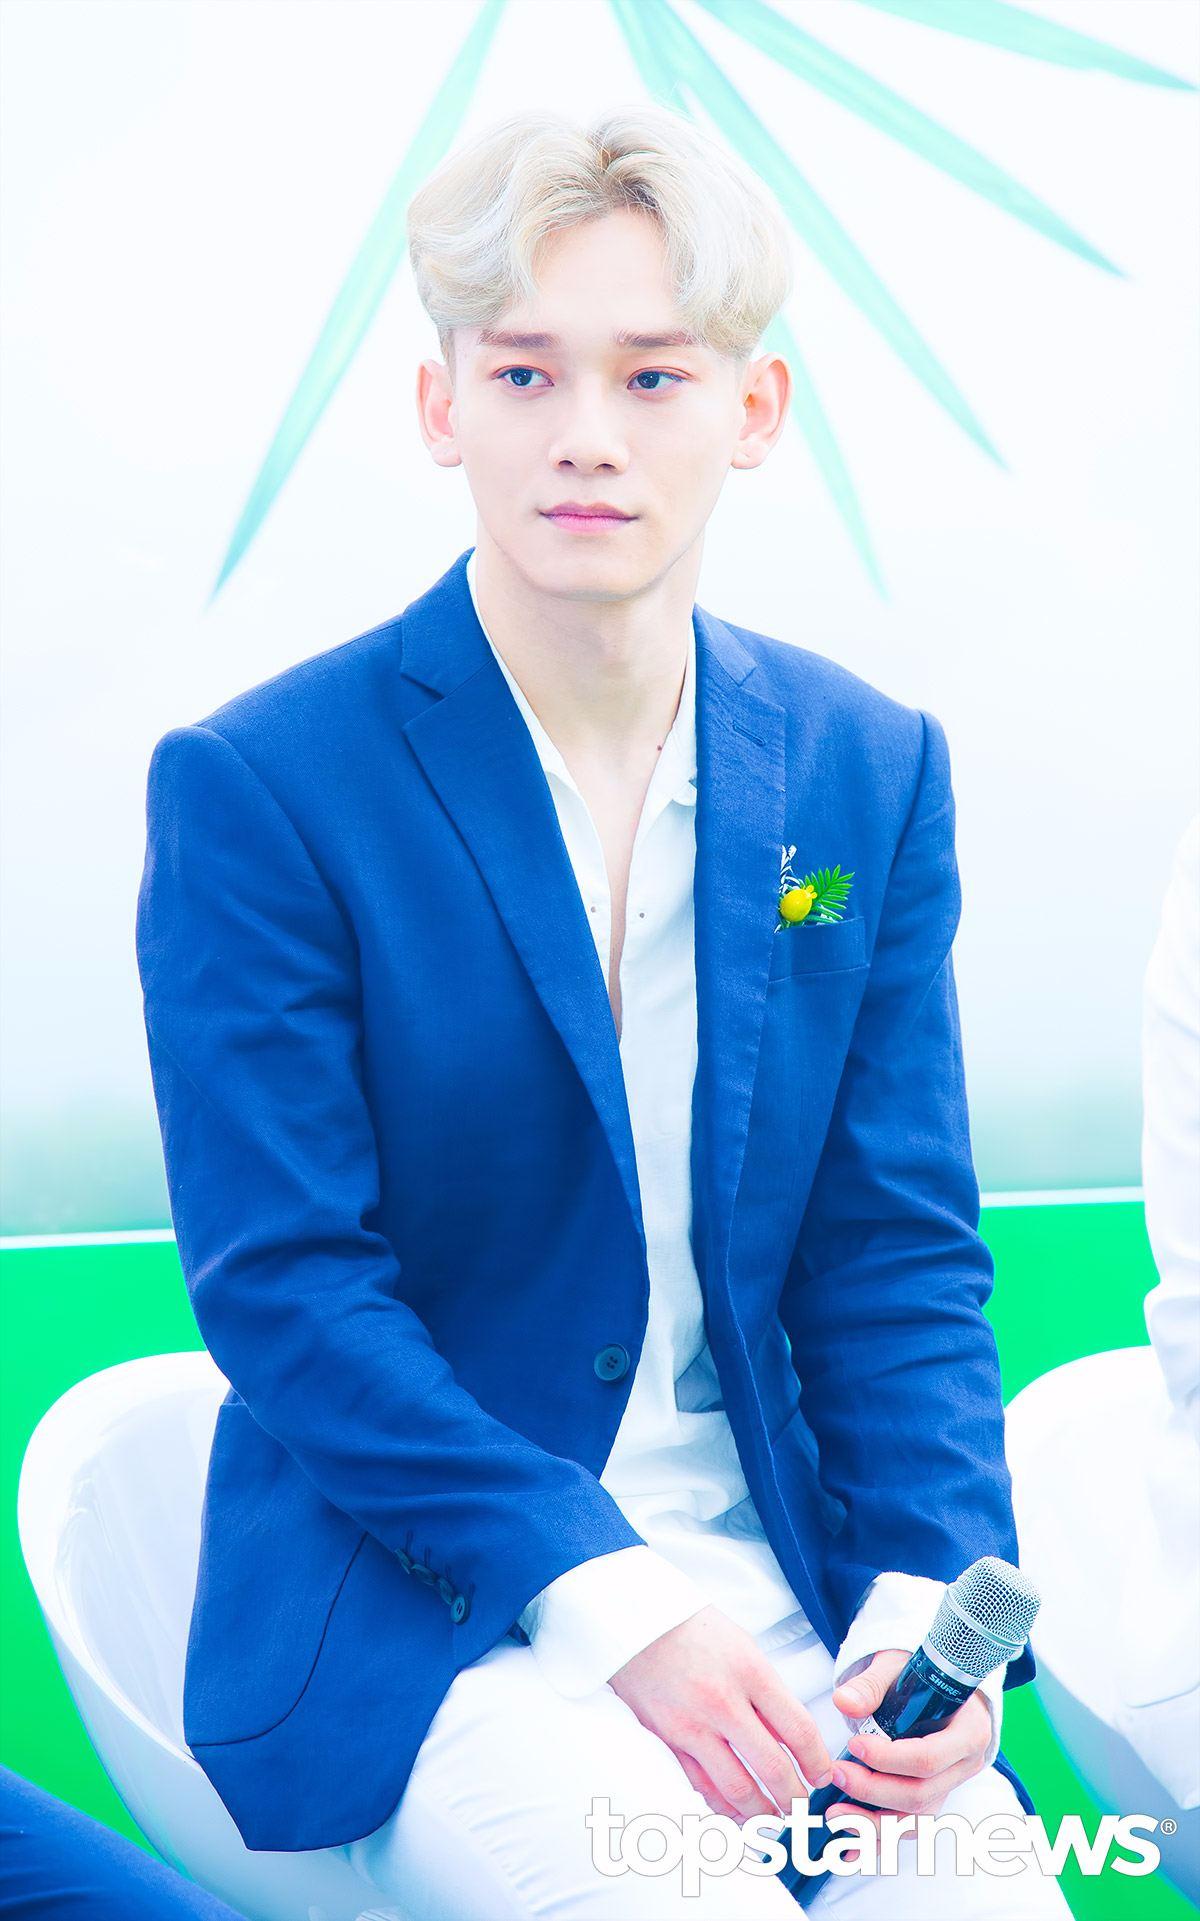 Chen的髮型是最近韓國男生很喜歡的64分法,利用微捲的彎度帶出頭頂的蓬度,有點復古的感覺。不過Chen的金髮可不是一般人可以駕馭的了啊!建議一般男生可以使用較深的顏色代替。